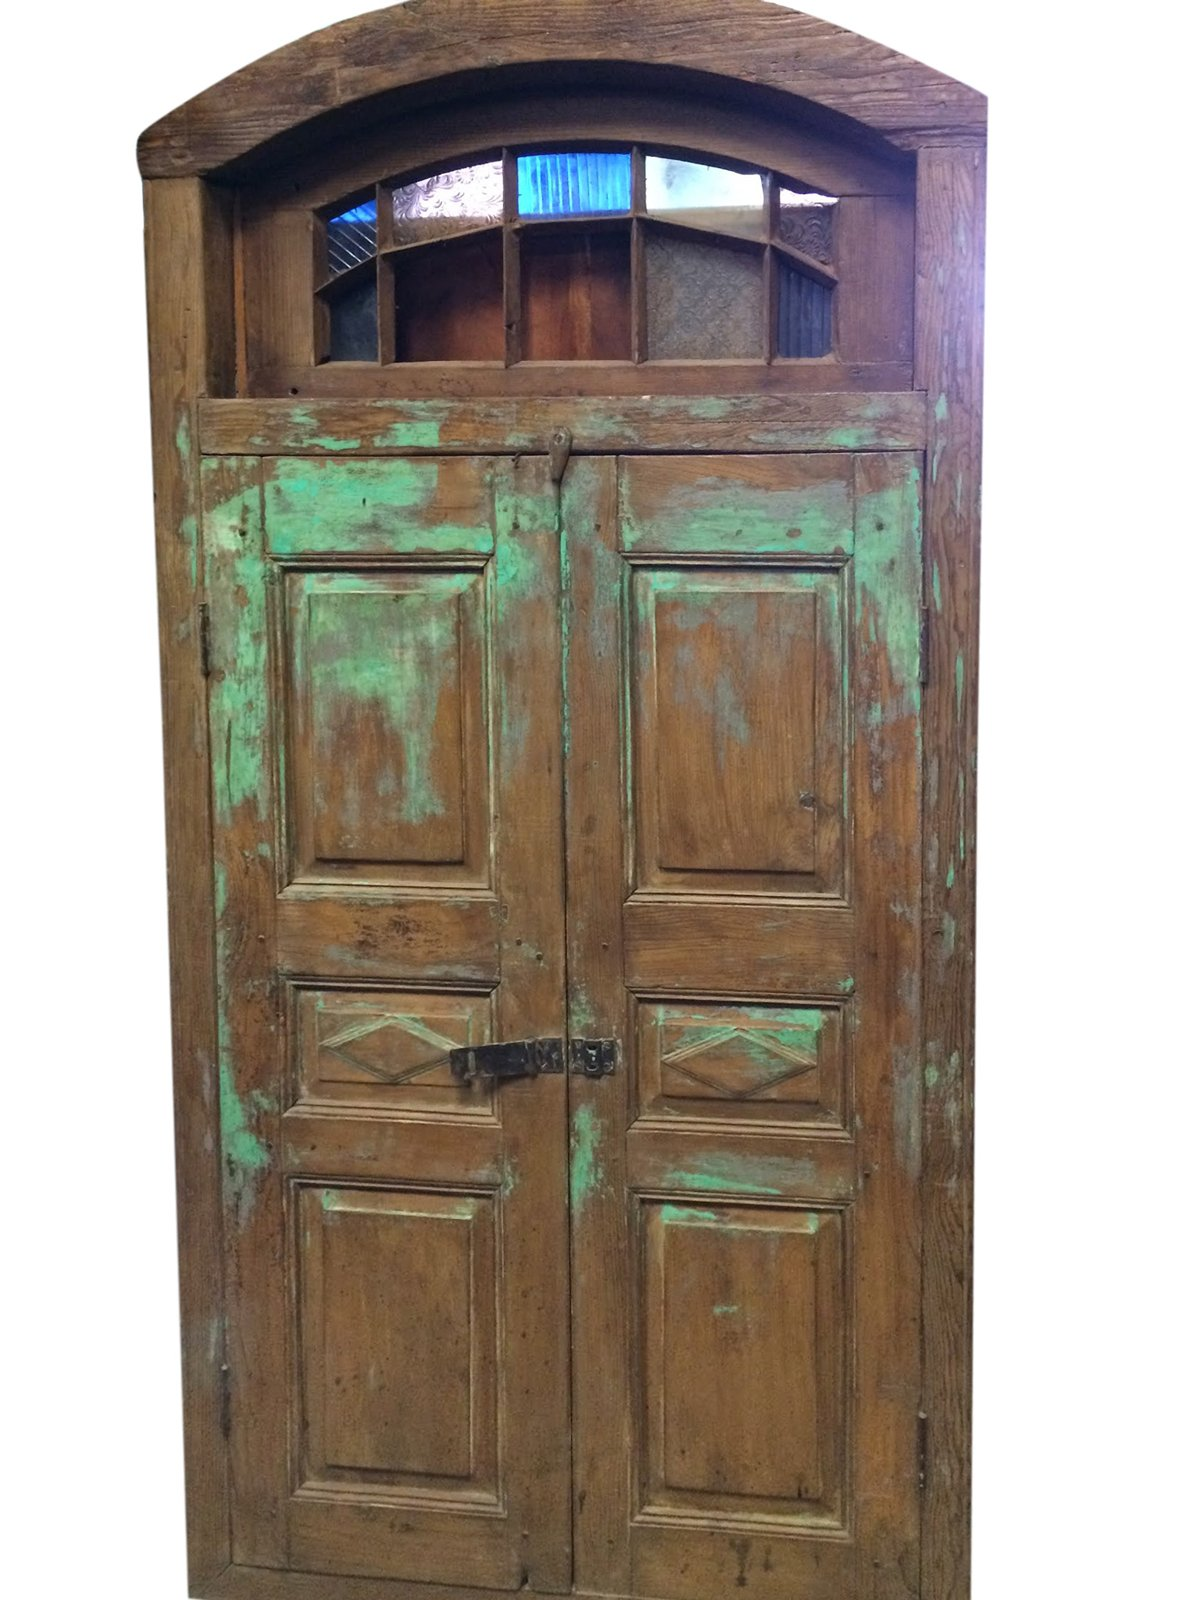 Antique Terrace Door Vintage Rustic Jharokha Window Architecturals Southern Decor